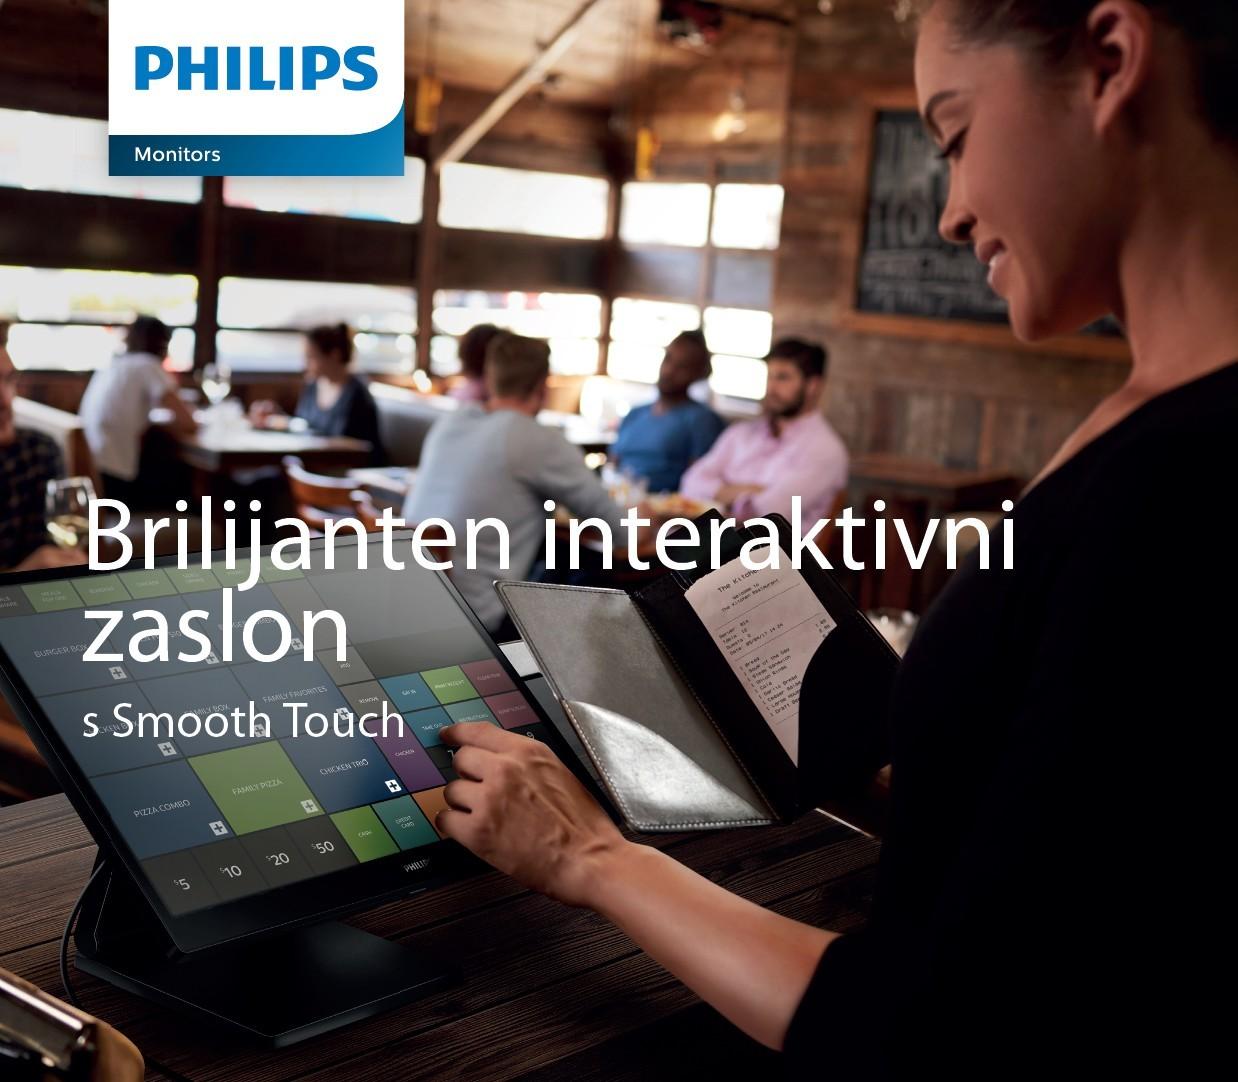 philips-monitor-na-dotik-242b9t-smoothtouch-restavracije.jpg